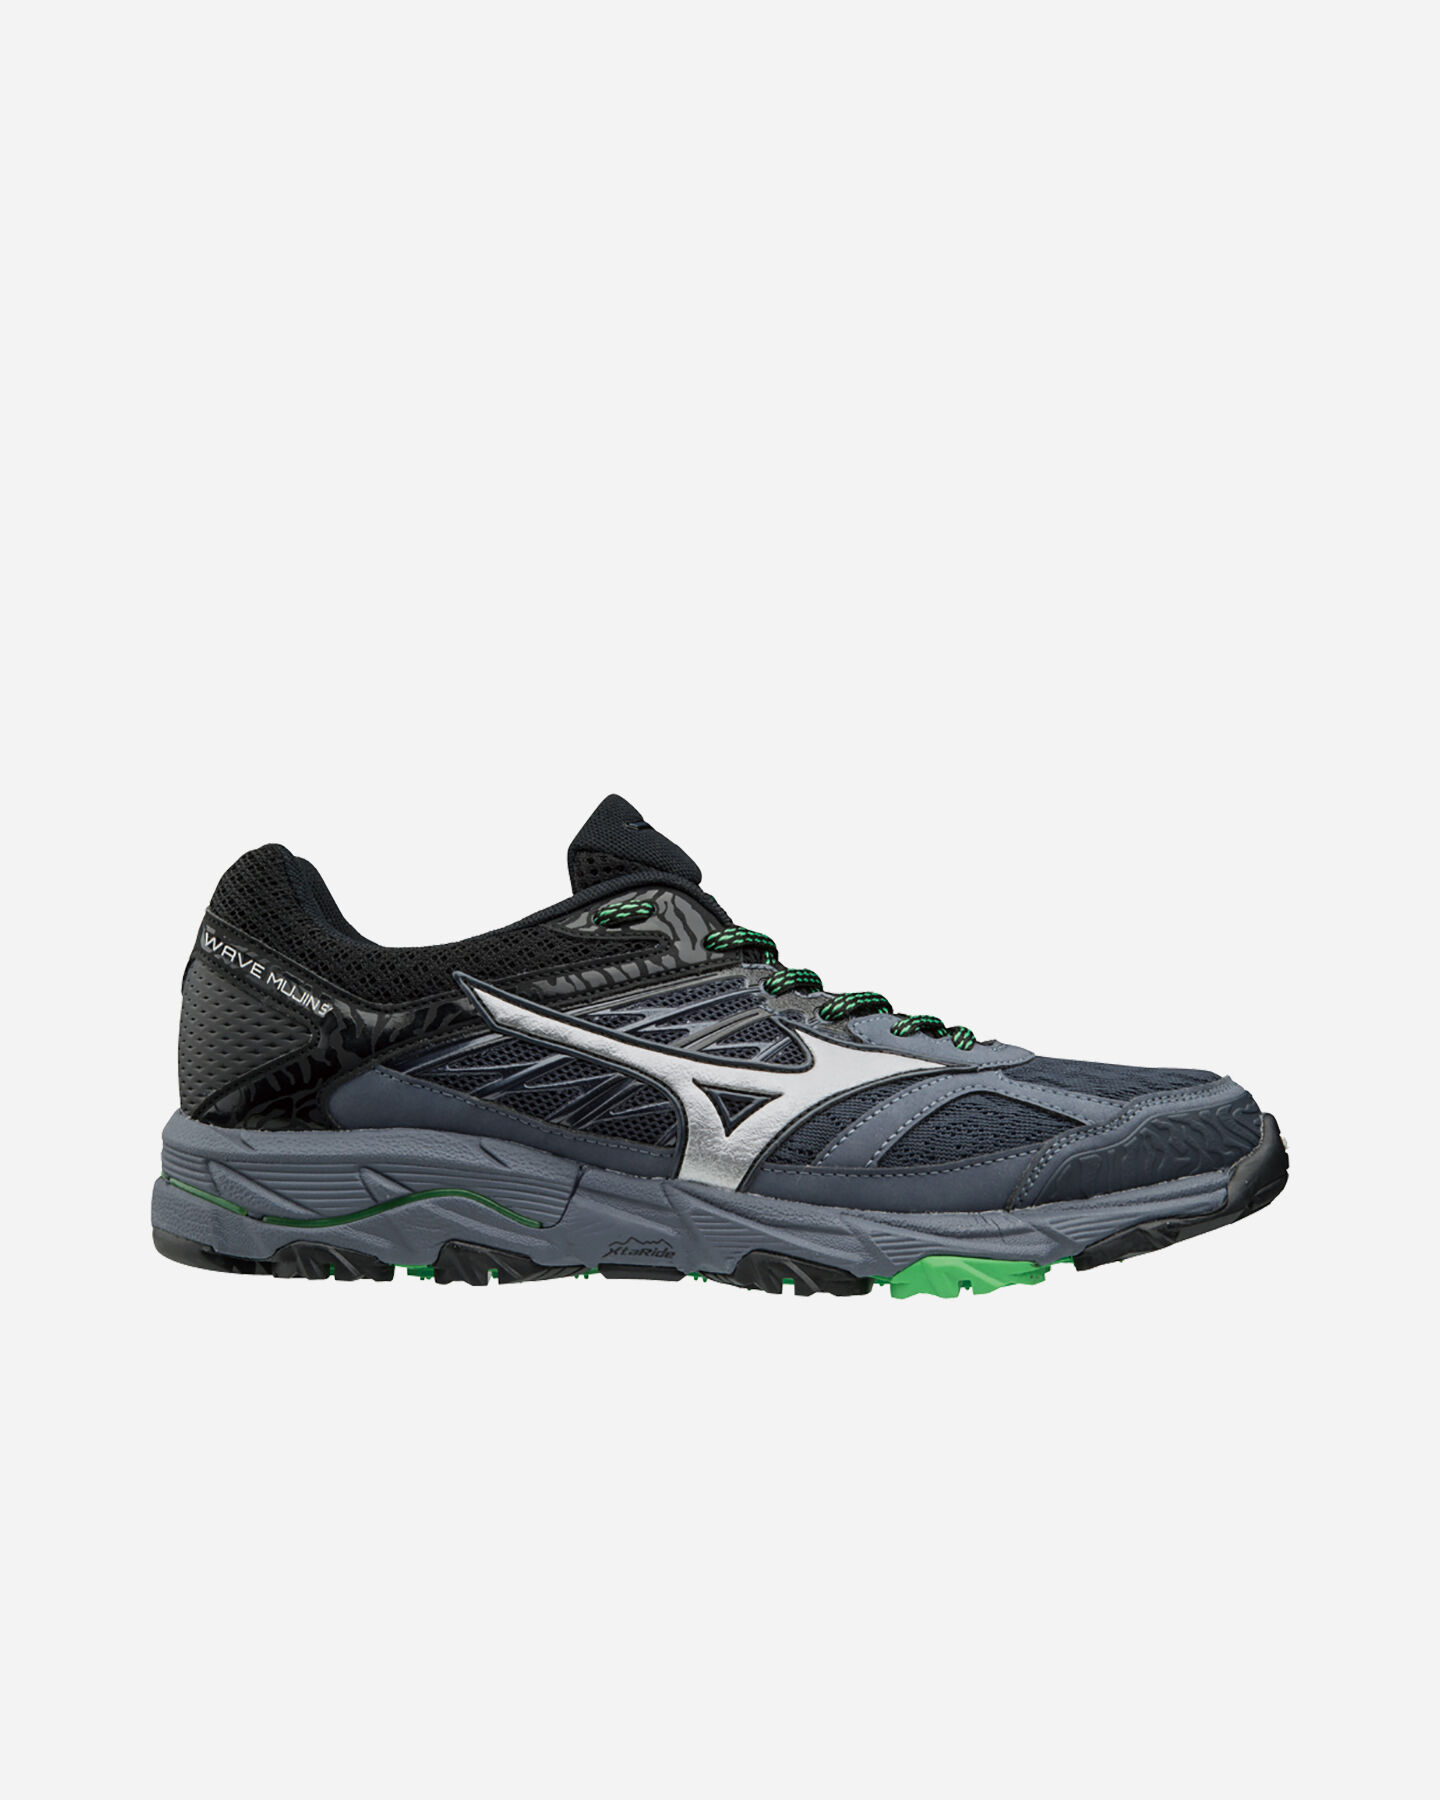 Running Trail Corsa Scarpe Cisalfa Running Da Sport E wqFW46gxz 96503ea6e0a